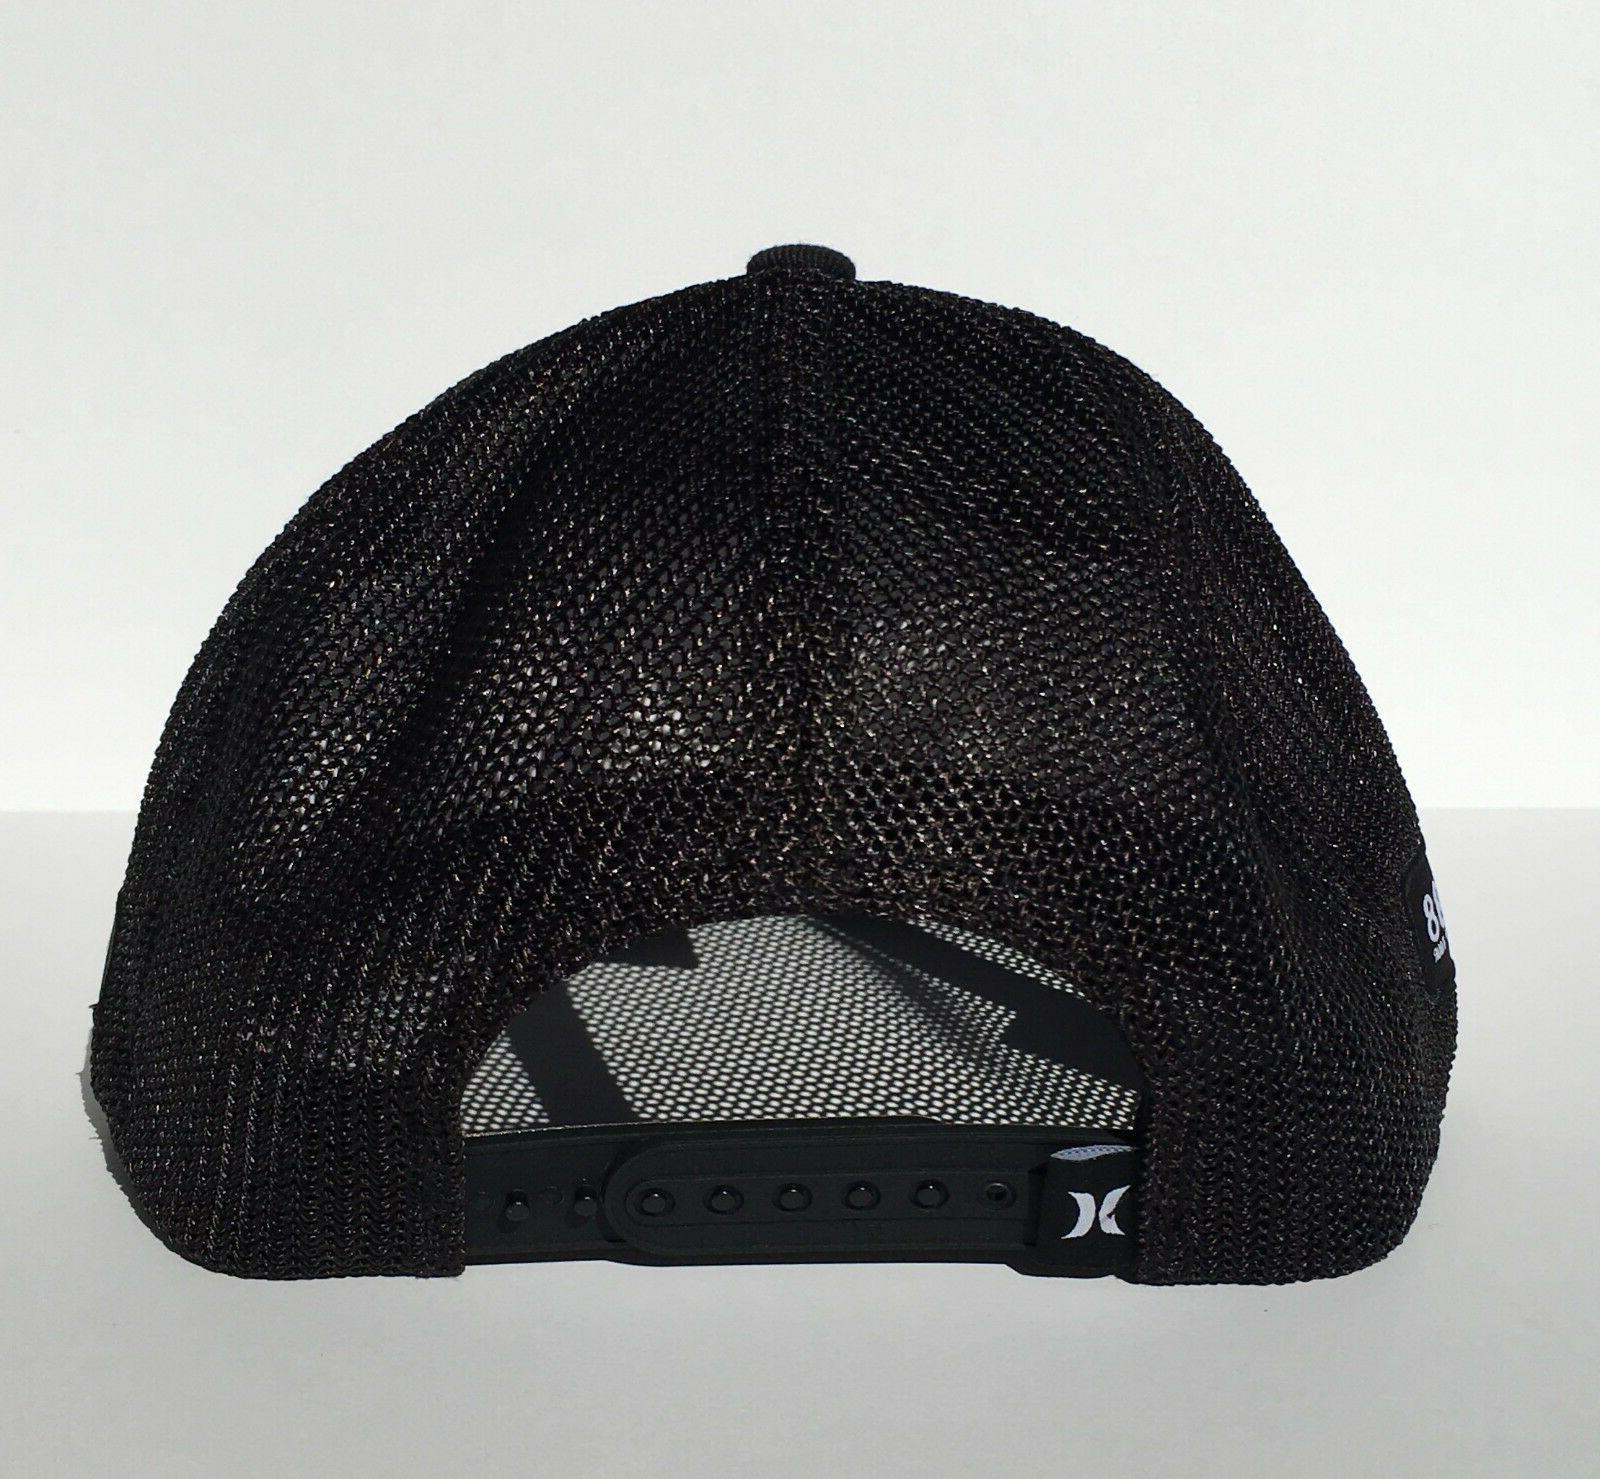 Hurley Pro Trestles Championship Hat FlexFit